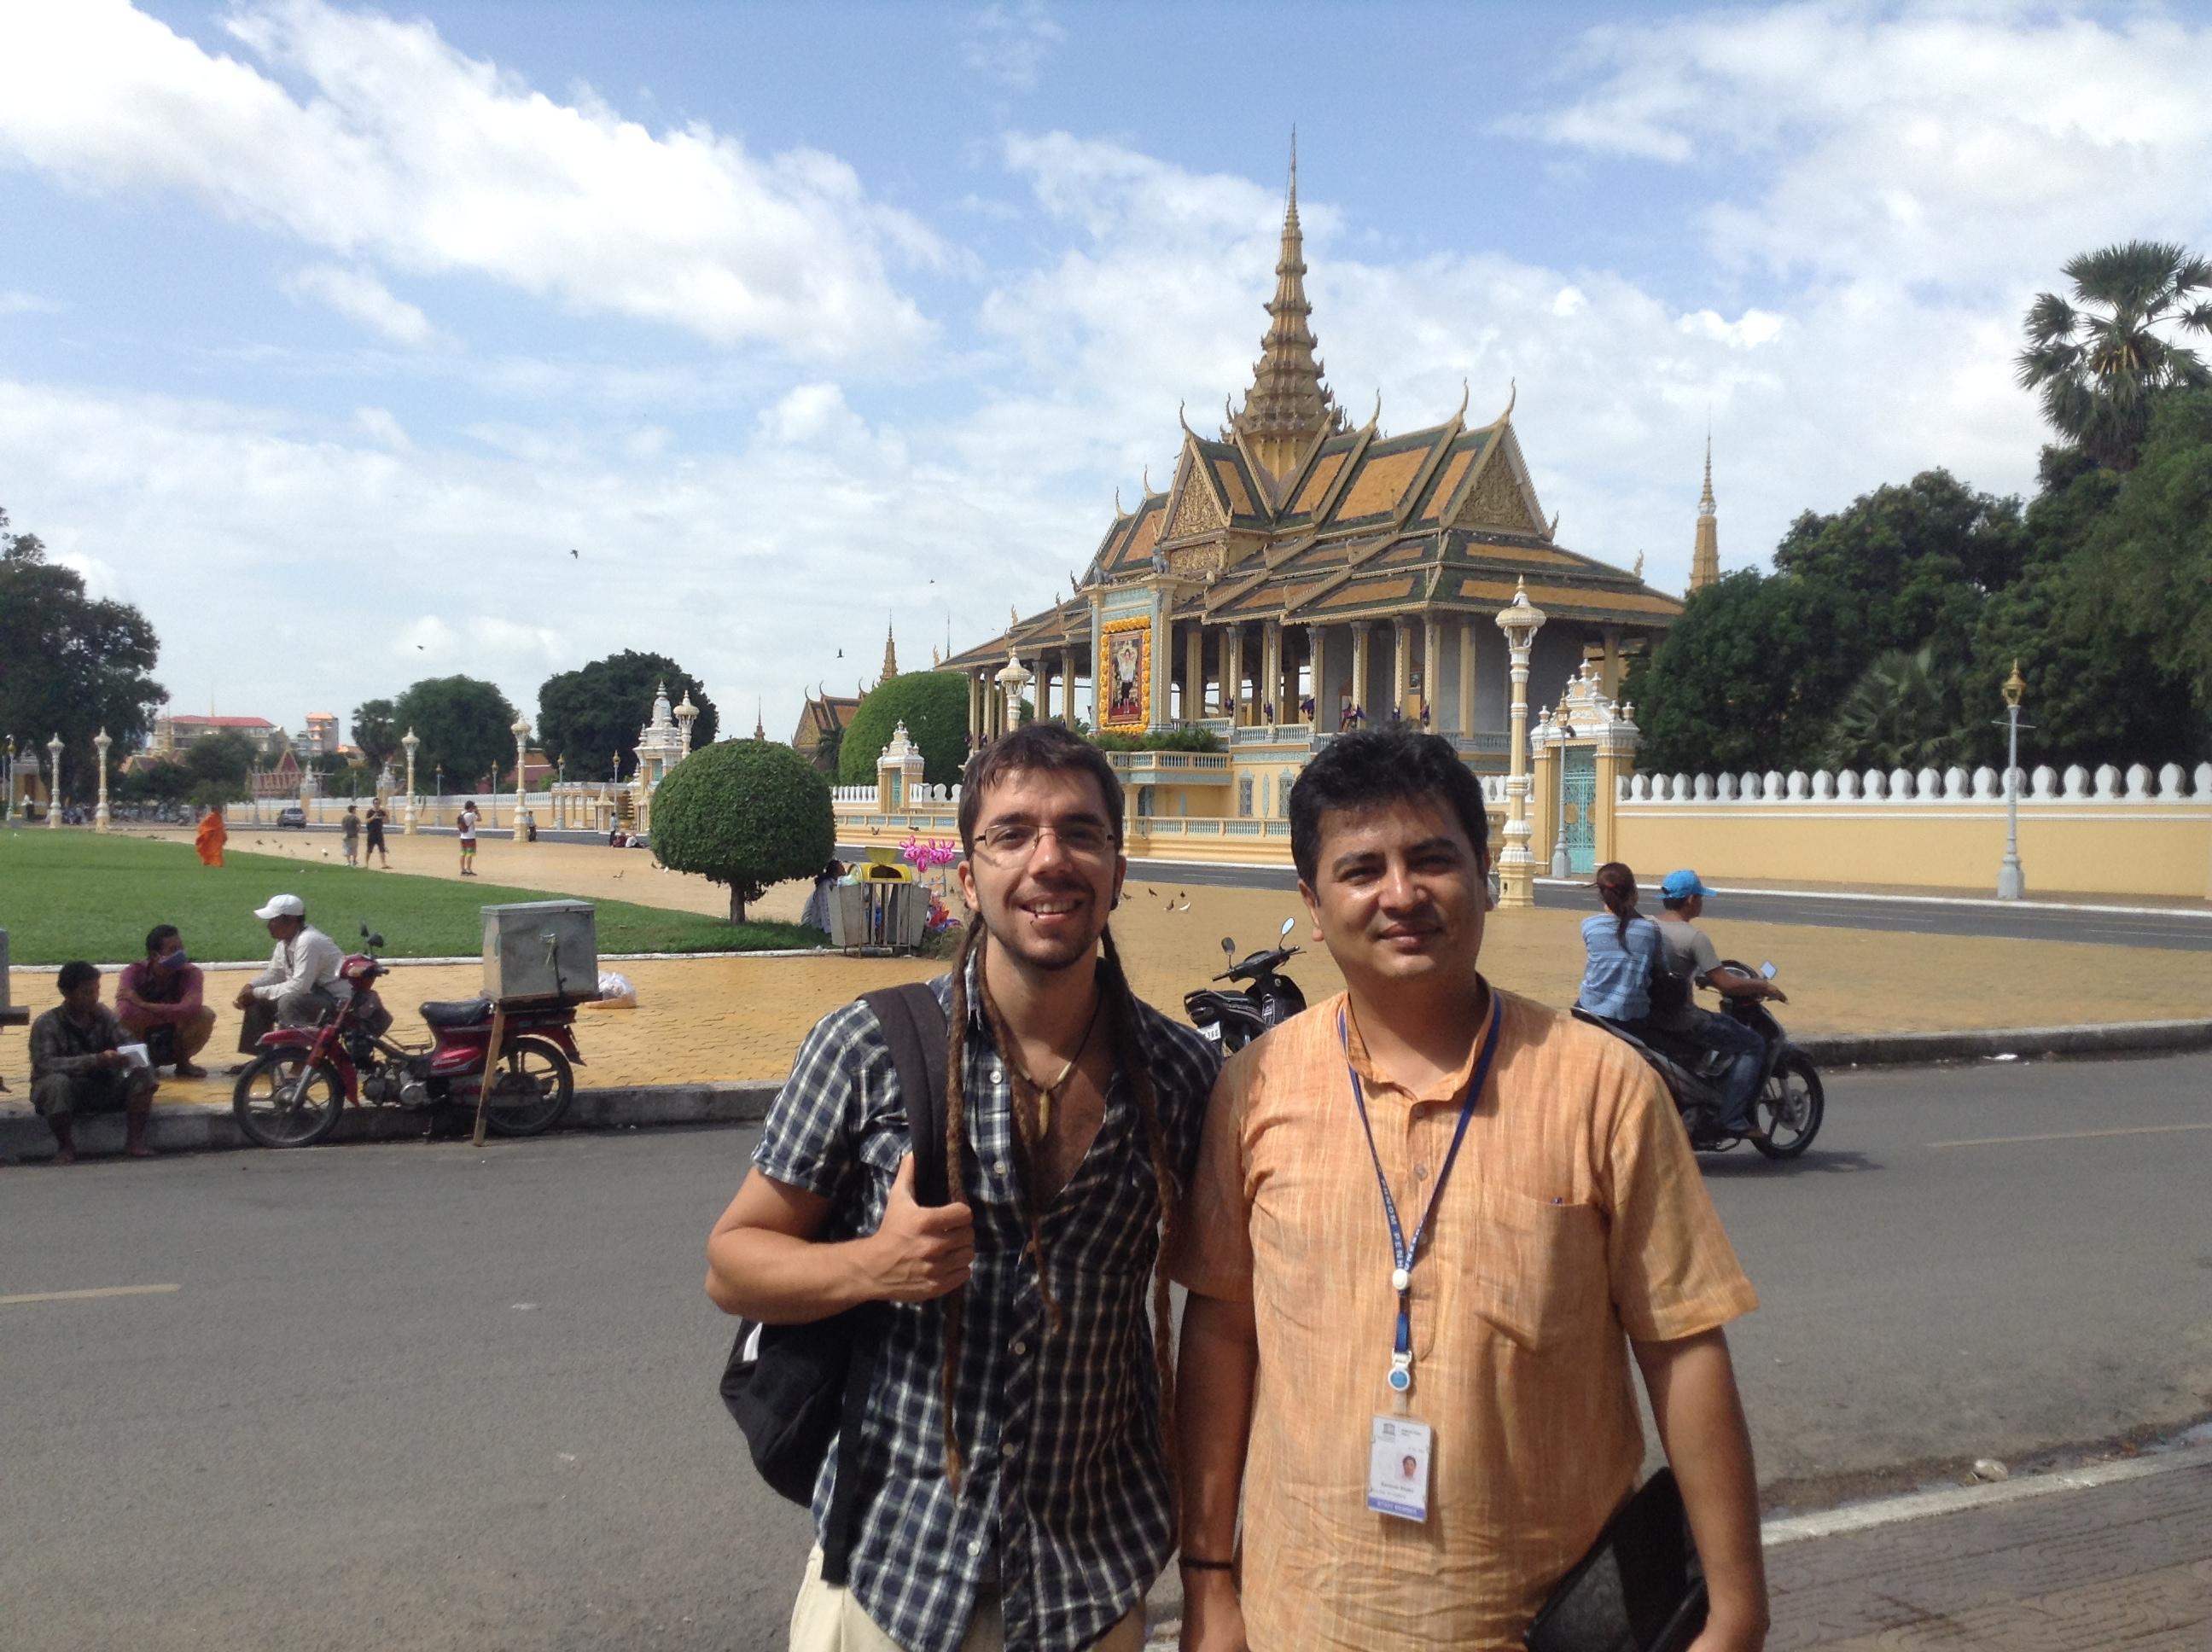 Mr. Santosh Khatri, Education Specialist at UNESCO Cambodia, Javier Collado, Global Education Magazine